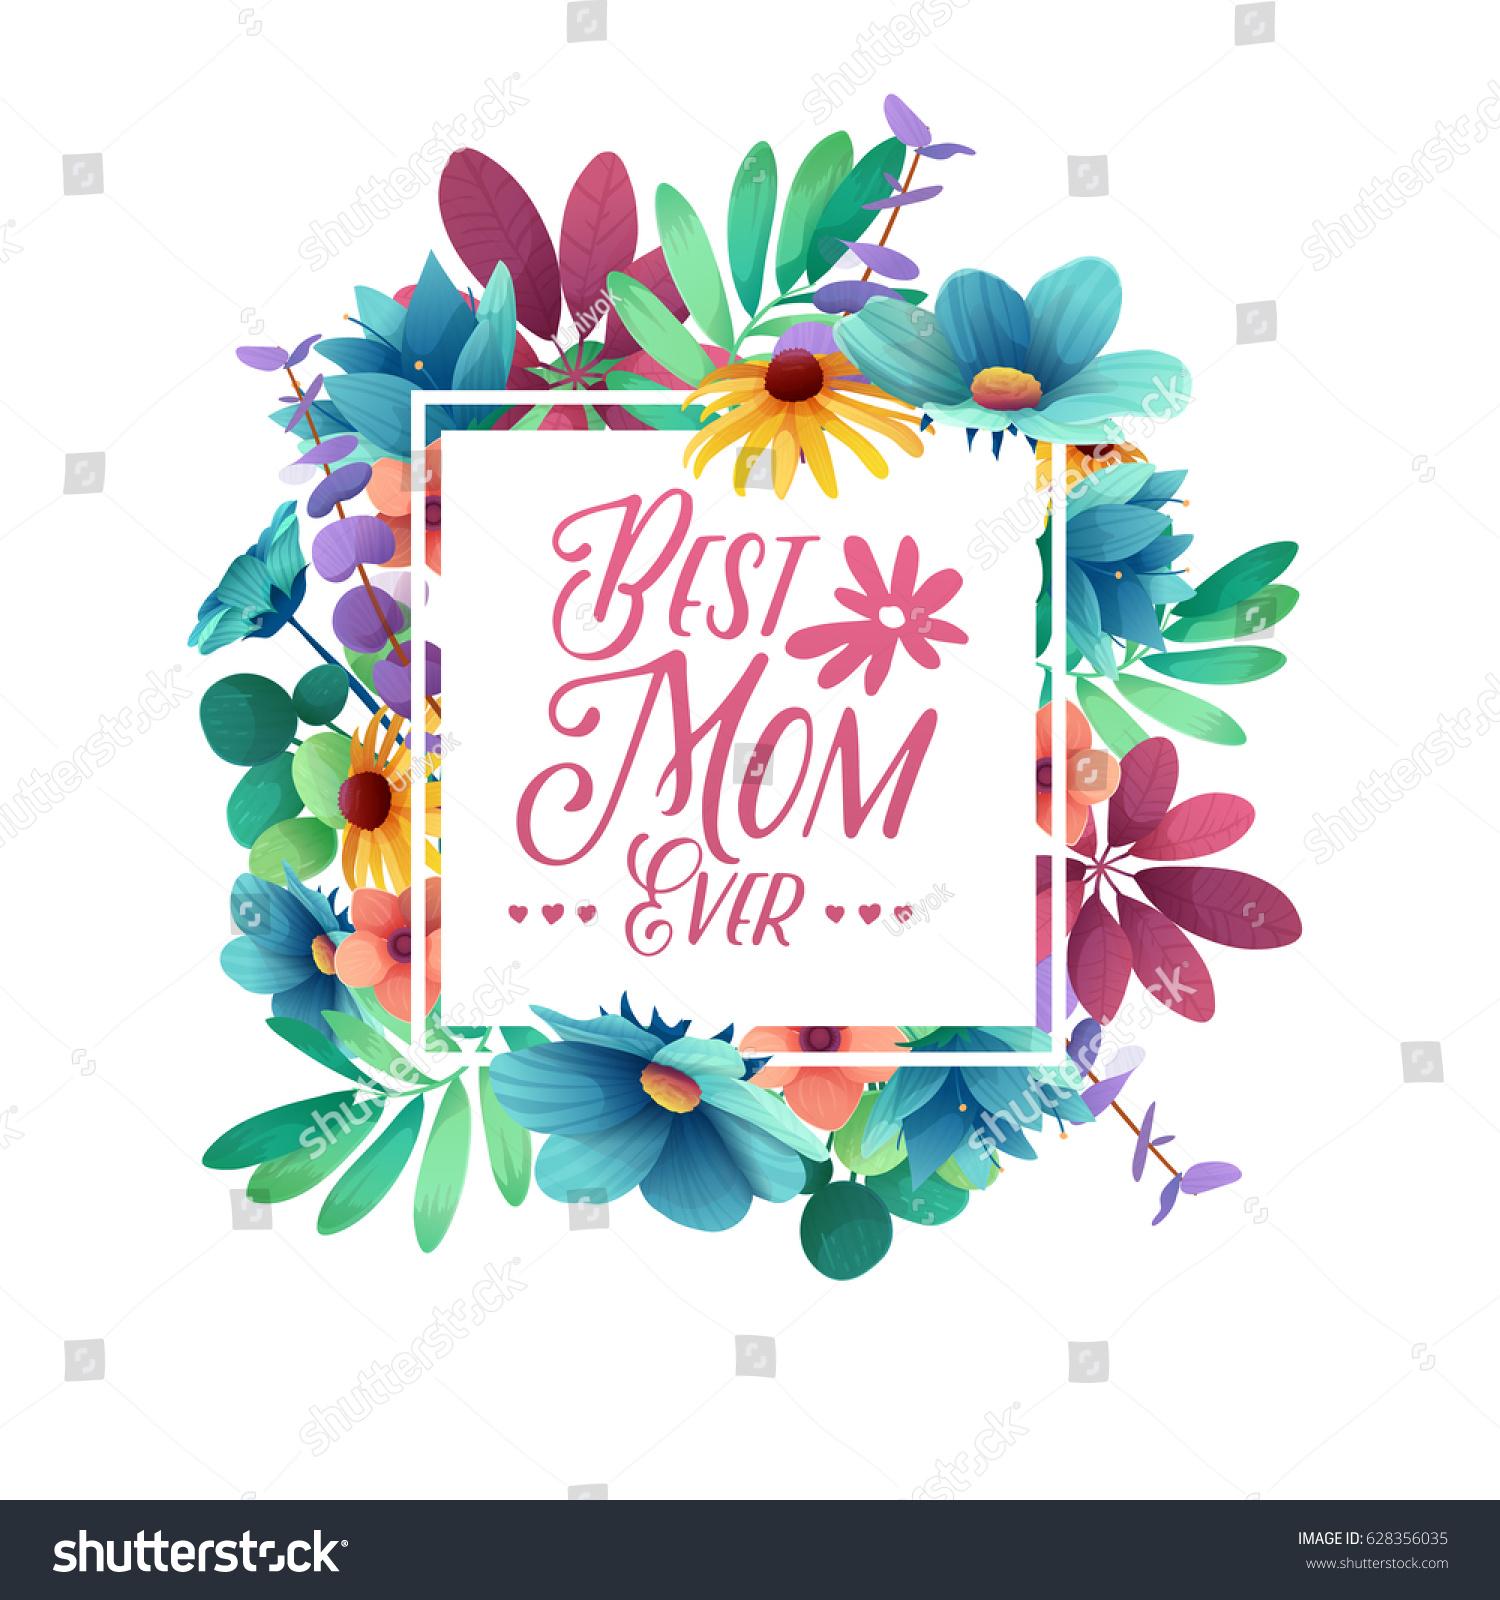 Design banner template - Template Design Banner Best Mom Ever